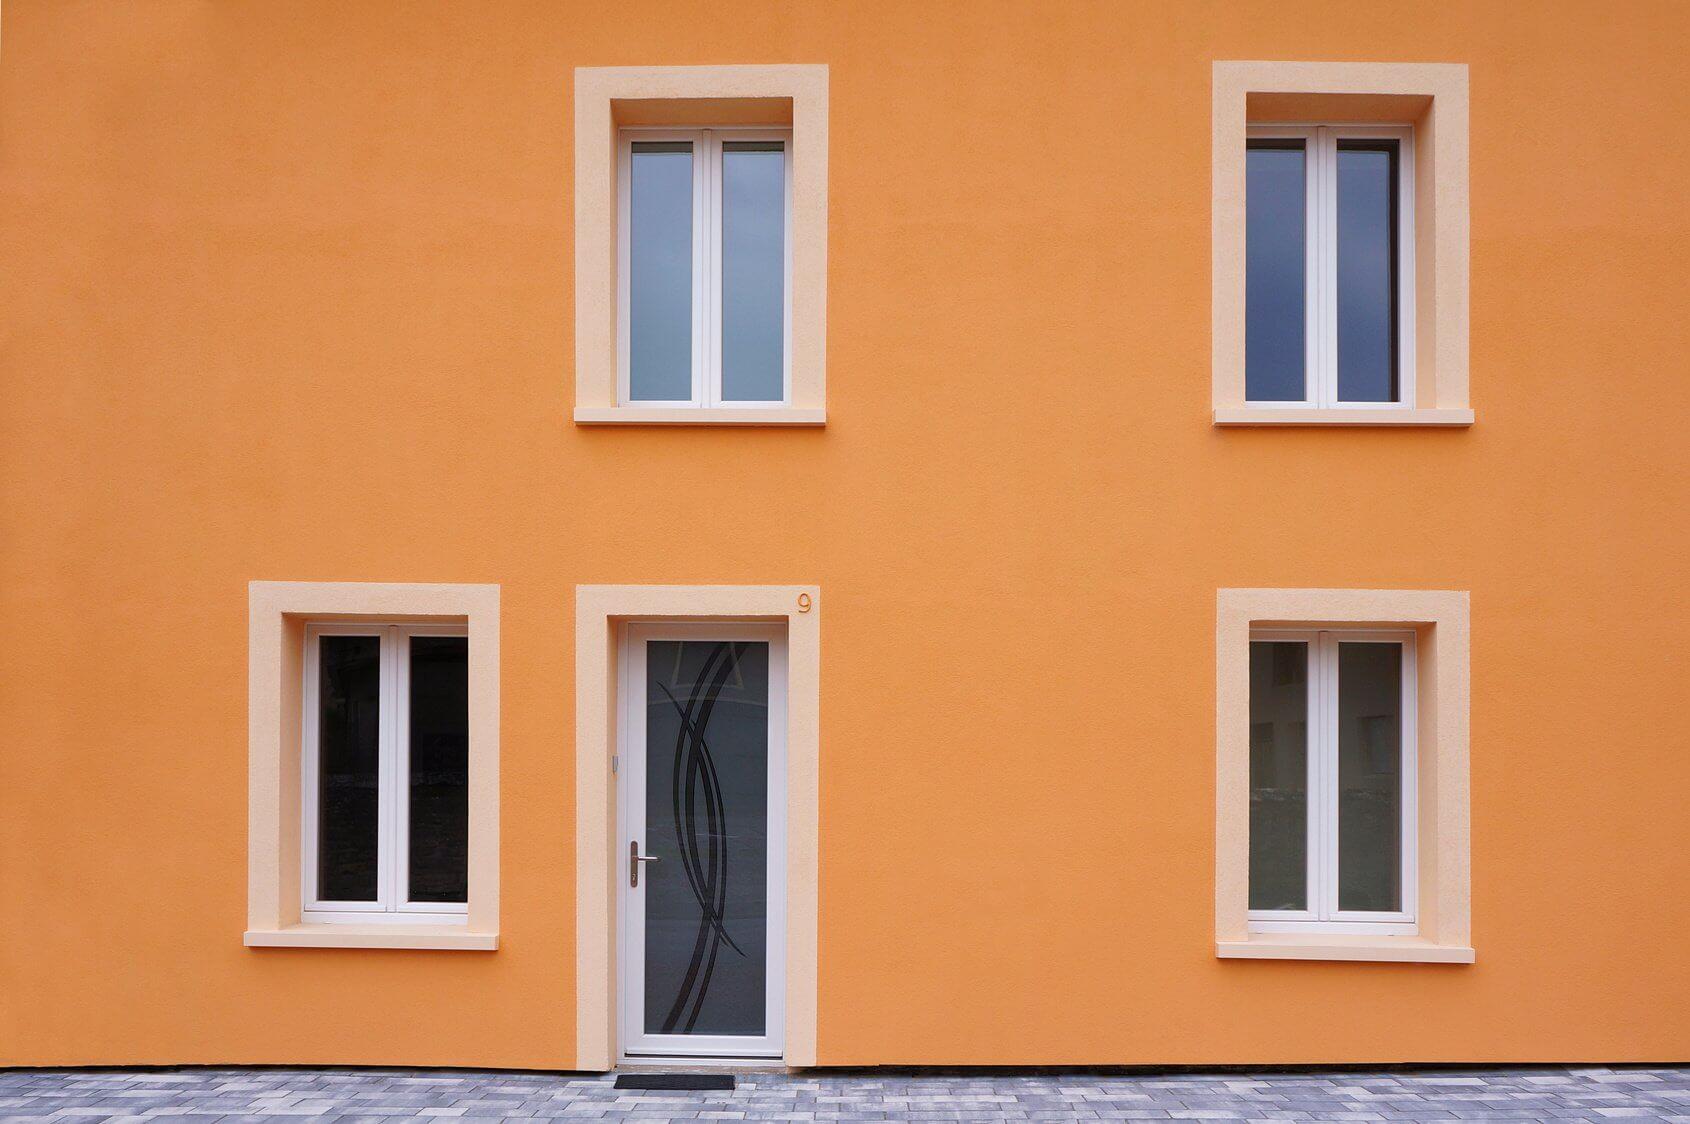 Enduit de finition de façade